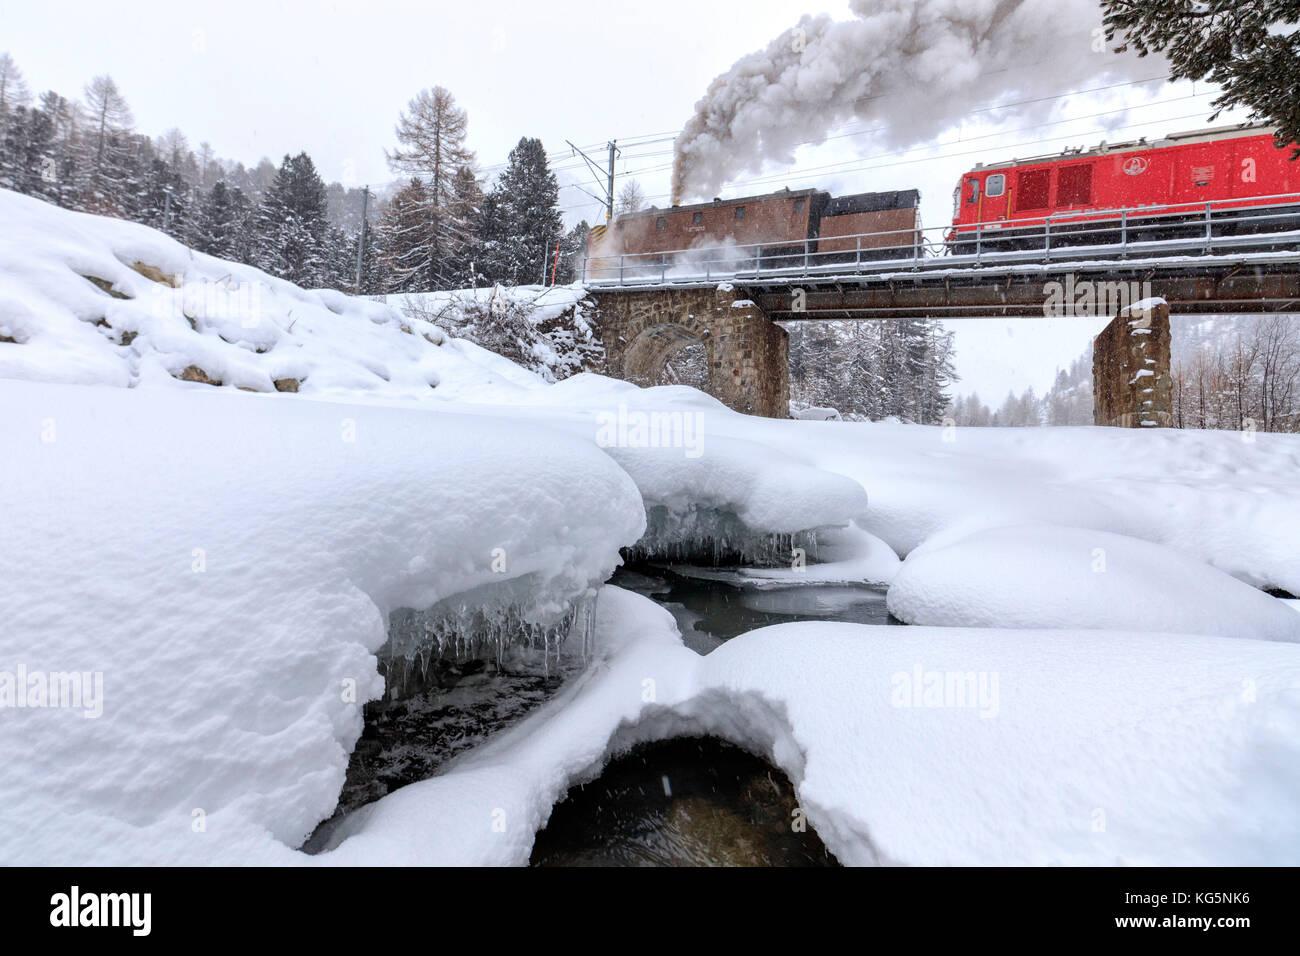 Steam of the snowplow of the Bernina Express train, Morteratsch, canton of Graubünden, Engadin Valley, Switzerland - Stock Image